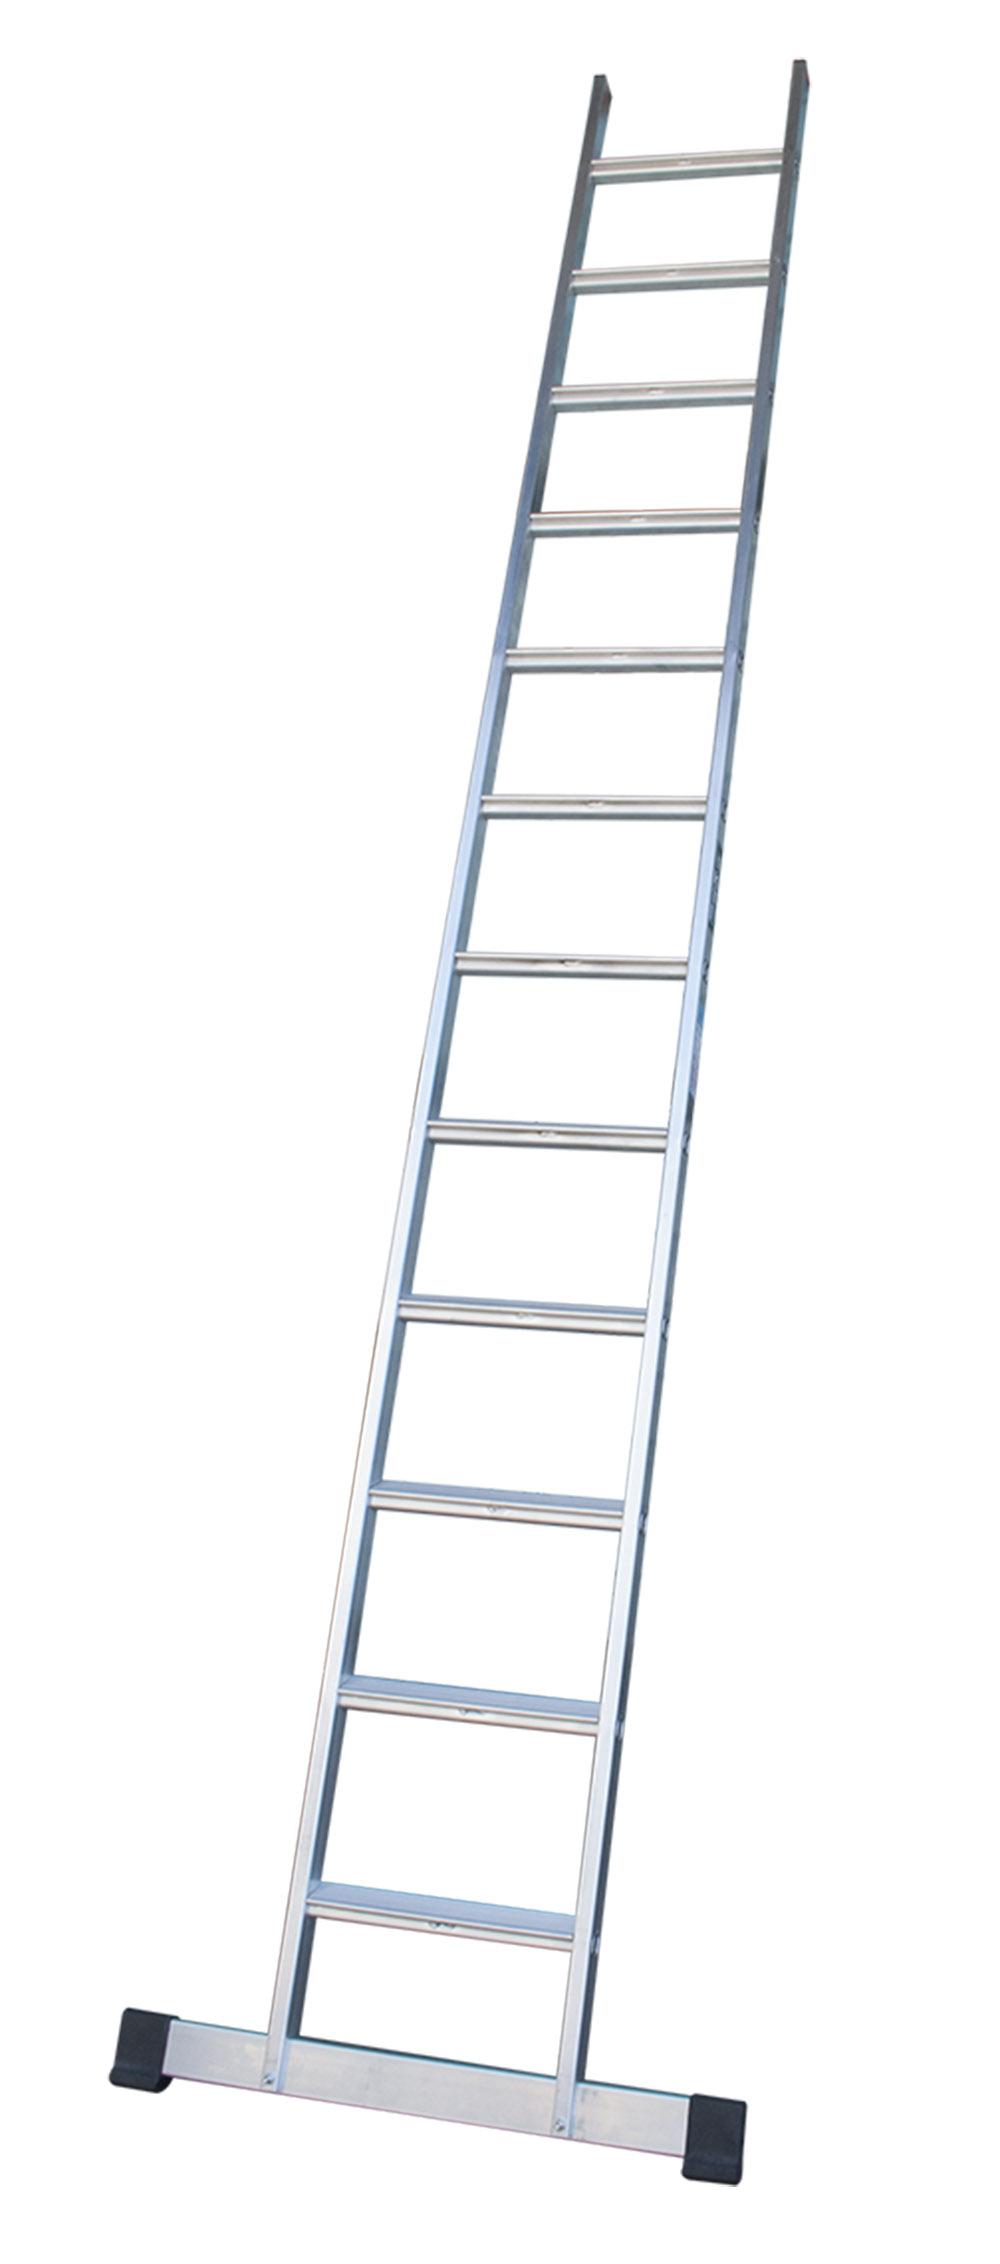 23113012-escalera-fija-peldano-ancho Escalera fija peldaño ancho Escalera fija peldaño ancho 23113012 escalera fija peldano ancho